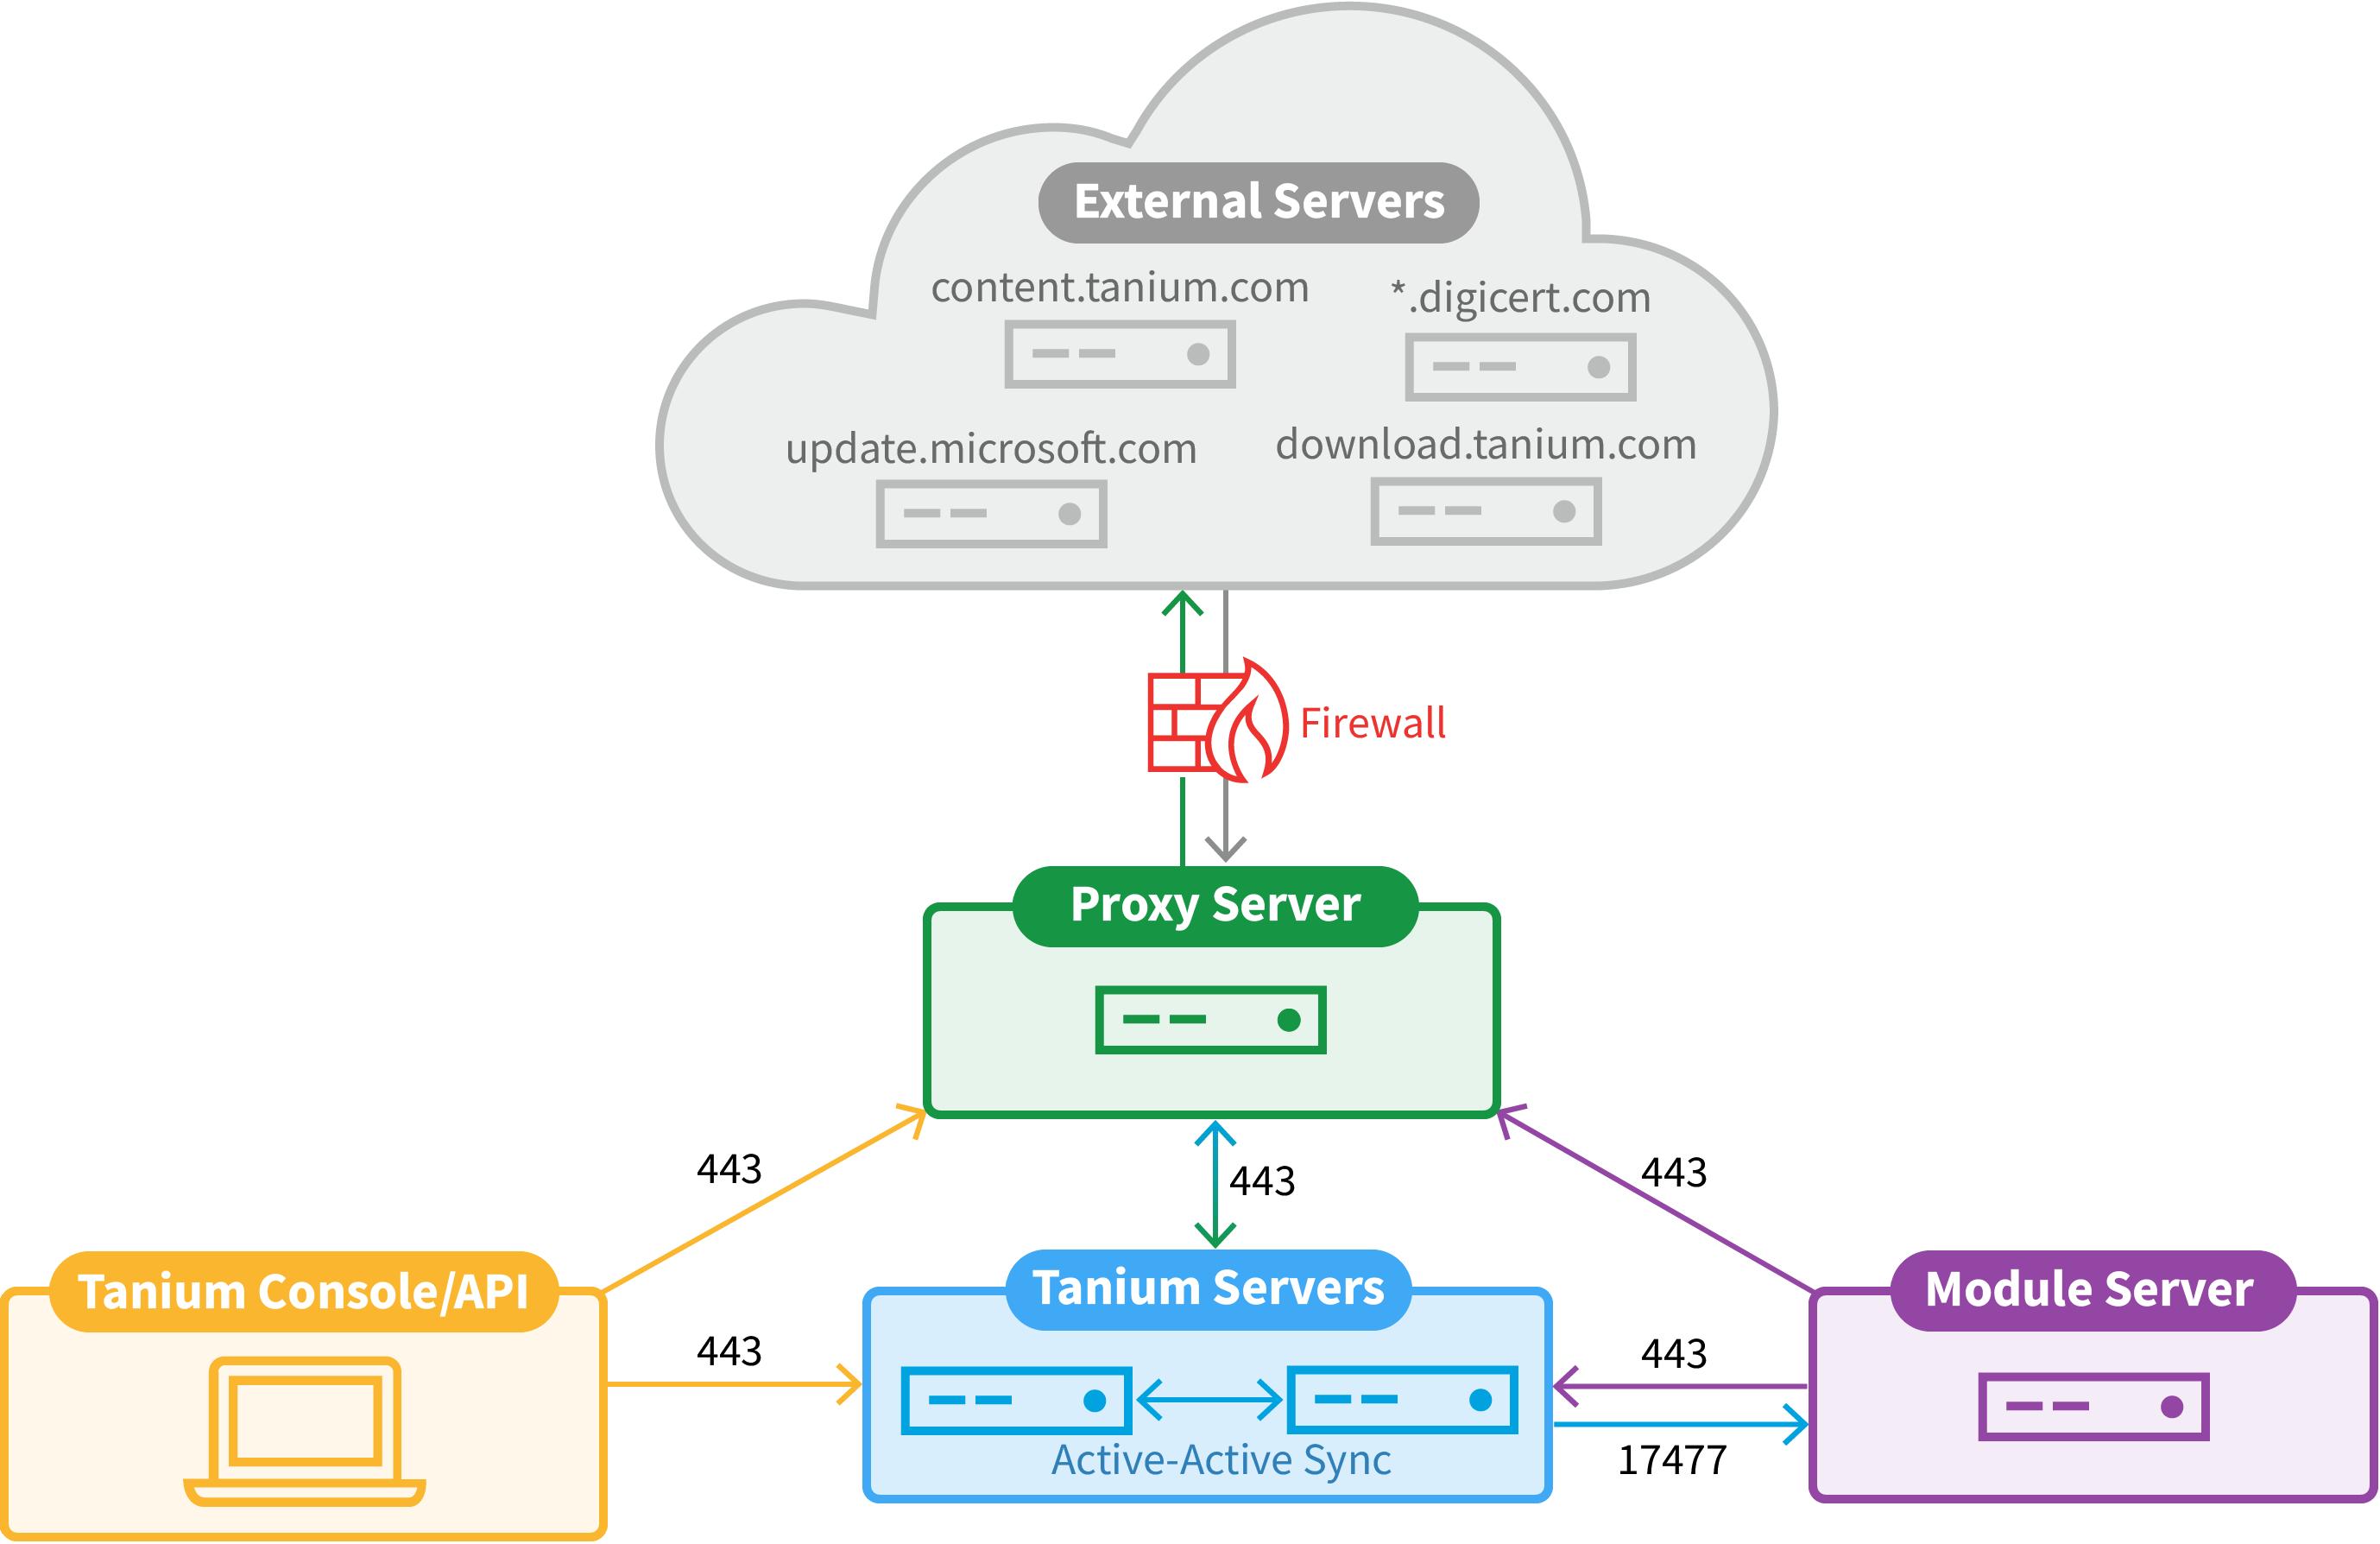 Configuring proxy server settings